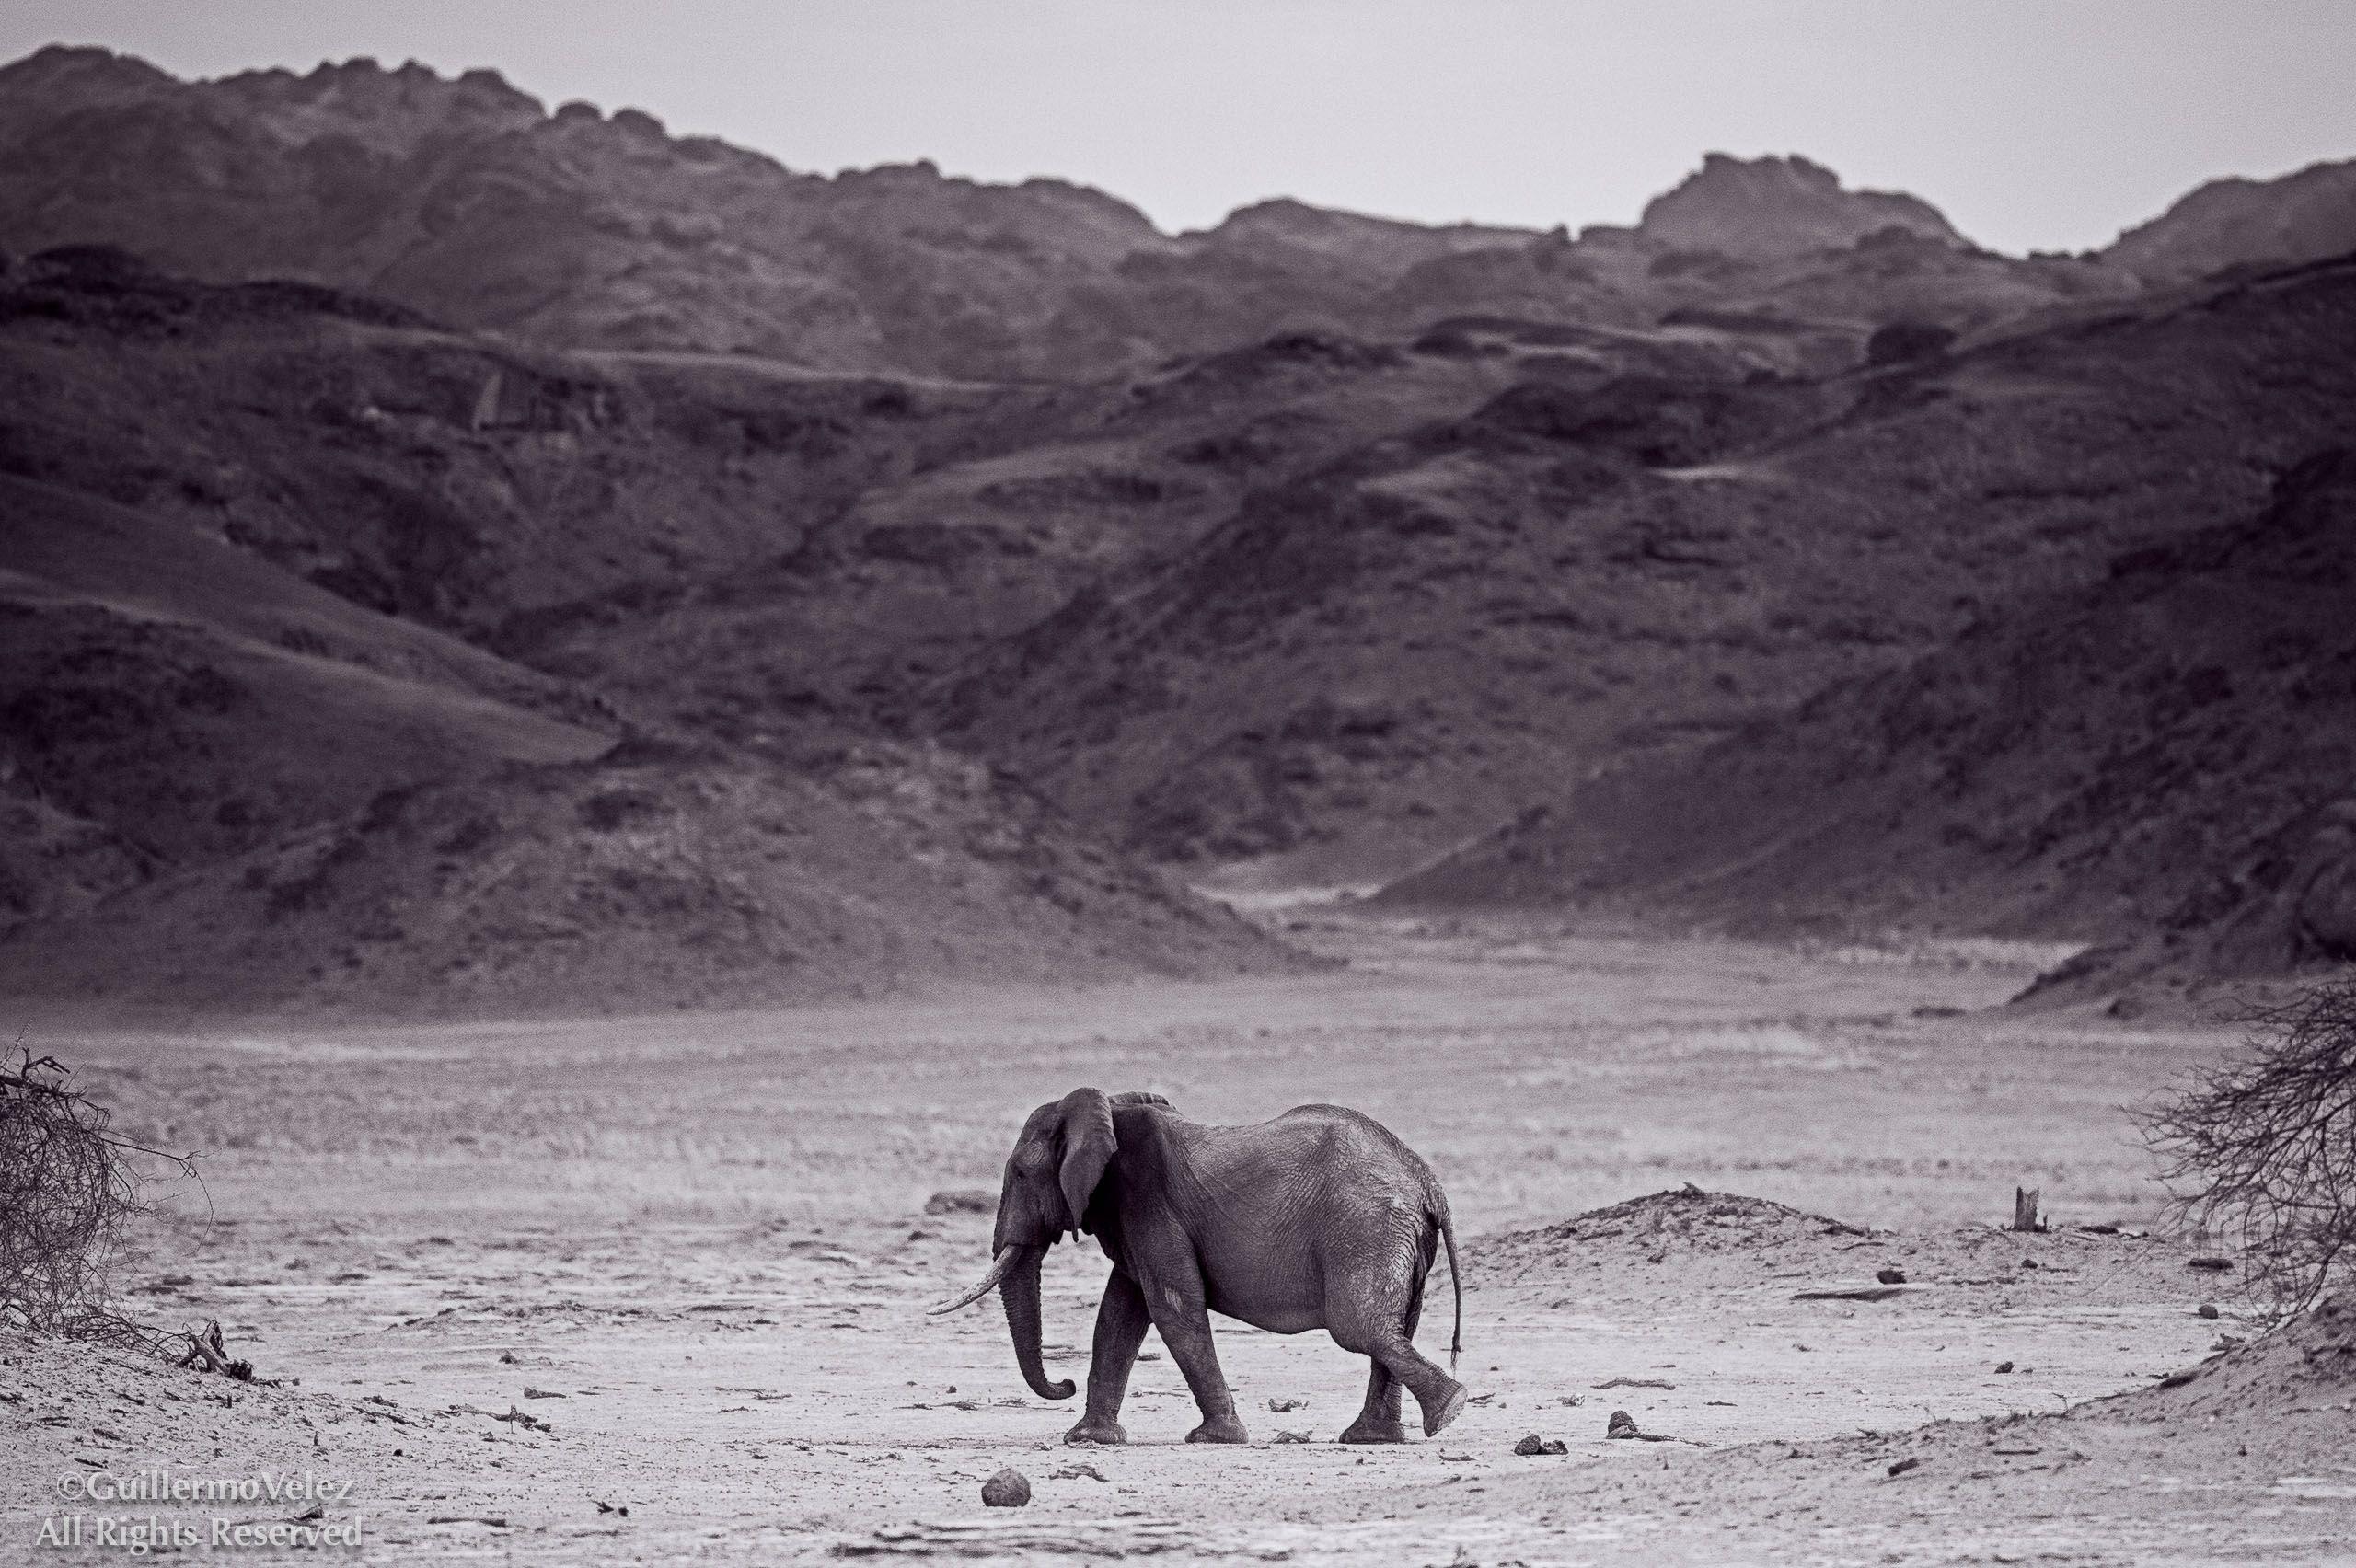 20141118_Namibia2_0326-Edit.jpg